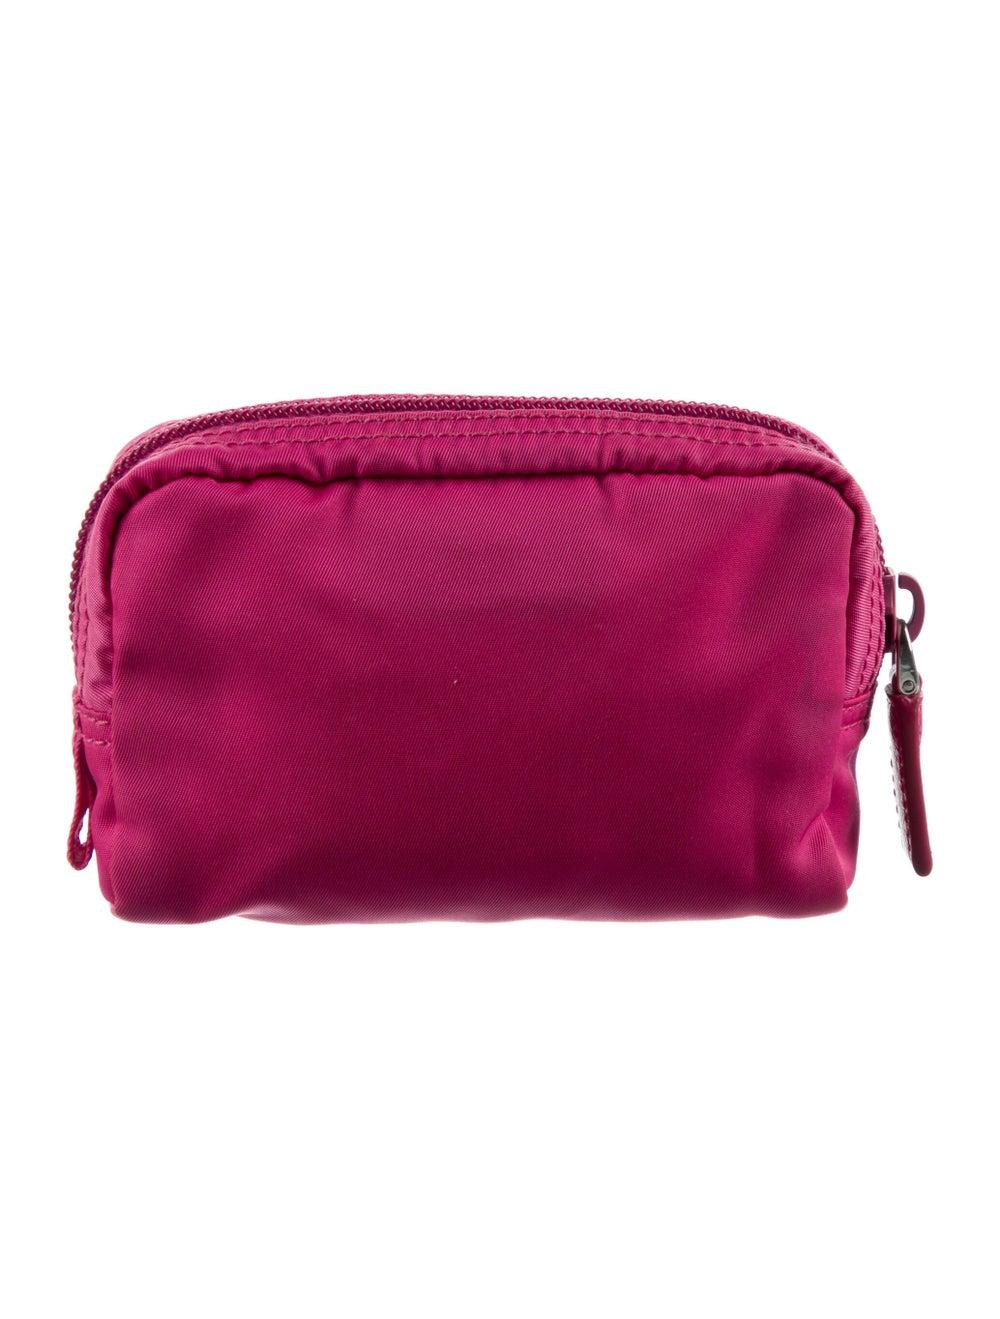 Prada Tessuto Cosmetic Bag Pink - image 4